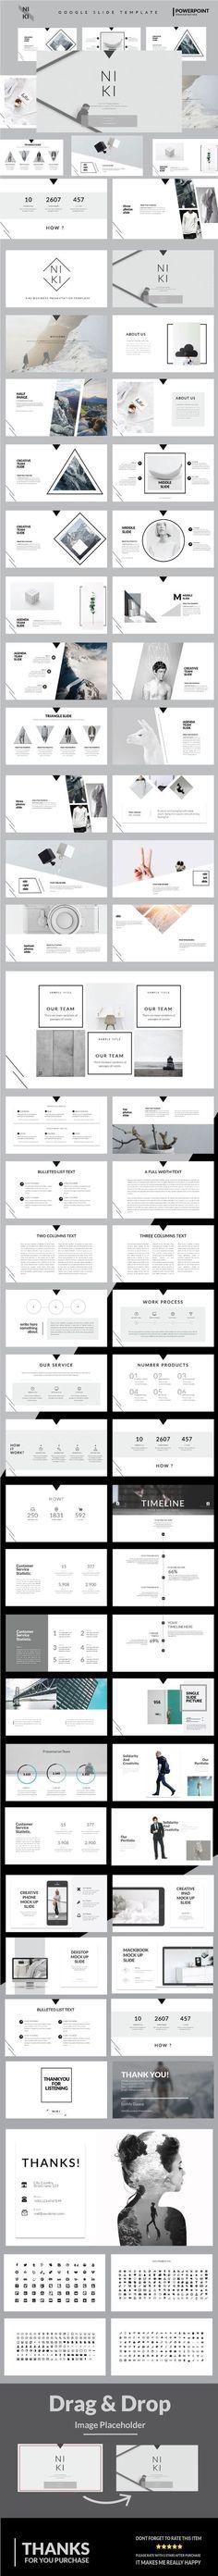 Kuniang Talua Powerpoint Template Presentation templates - contact details template